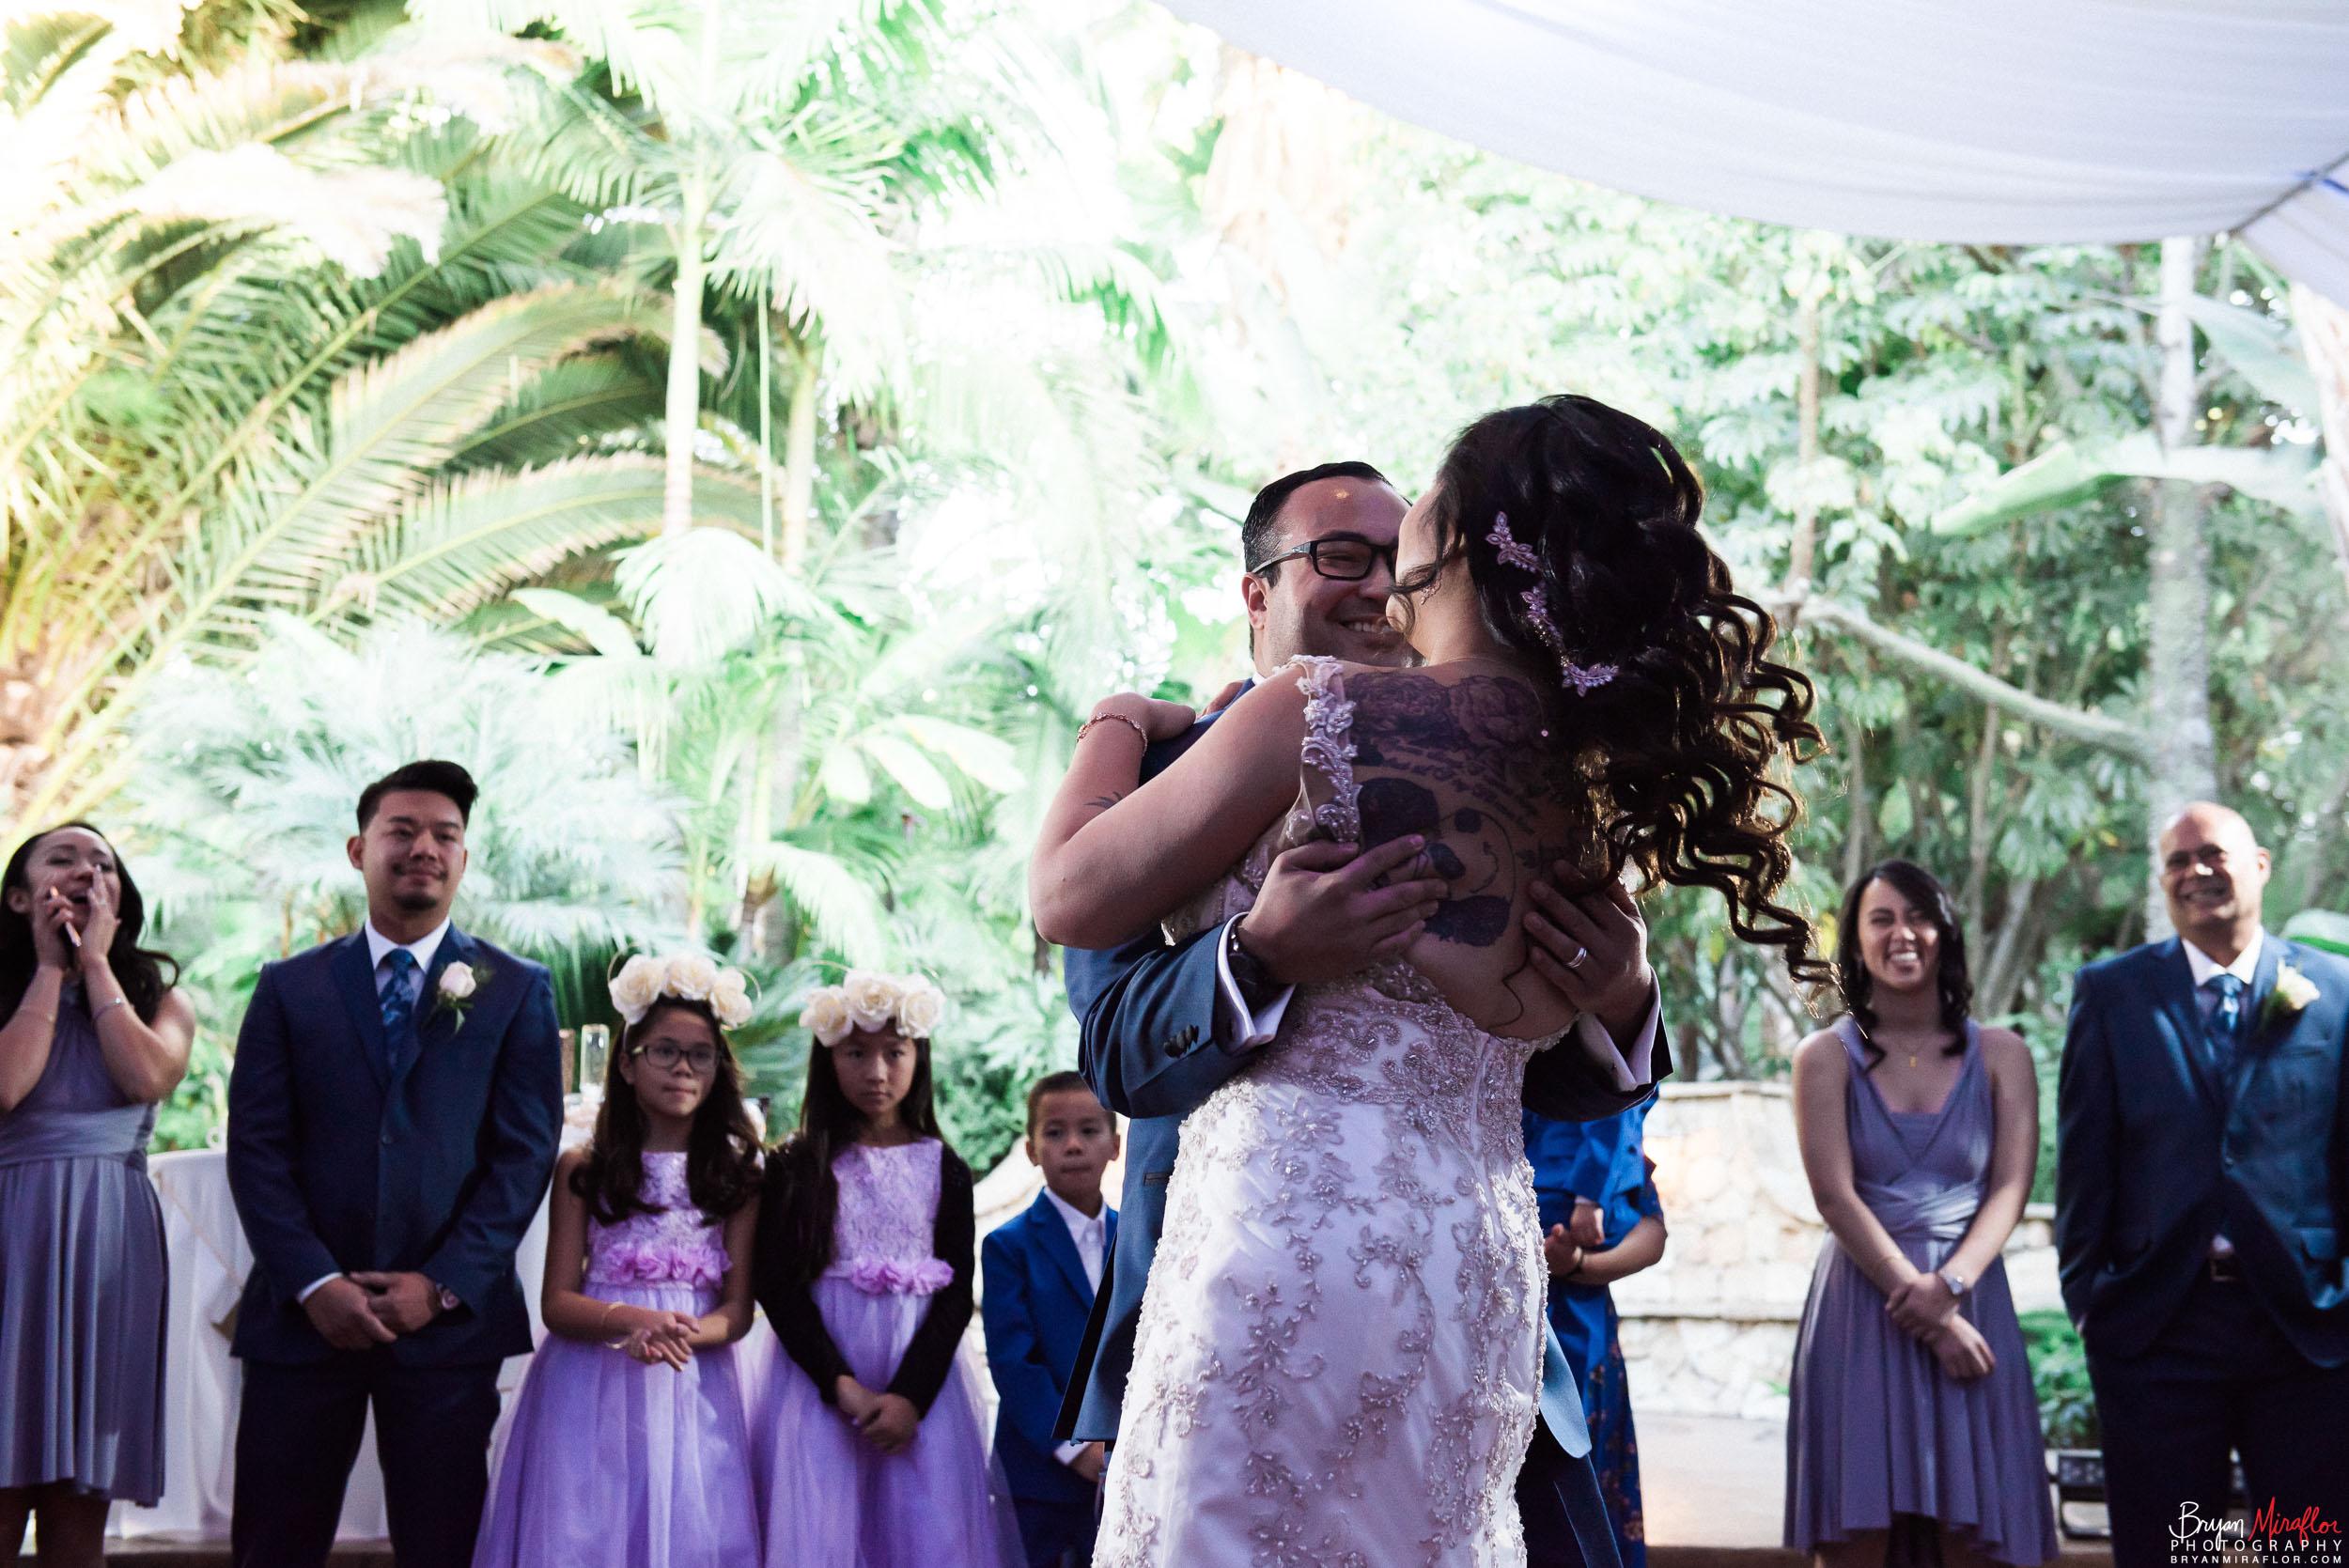 Bryan-Miraflor-Photography-Hannah-Jonathan-Married-Grand-Traditions-Estate-Gardens-Fallbrook-20171222-184.jpg